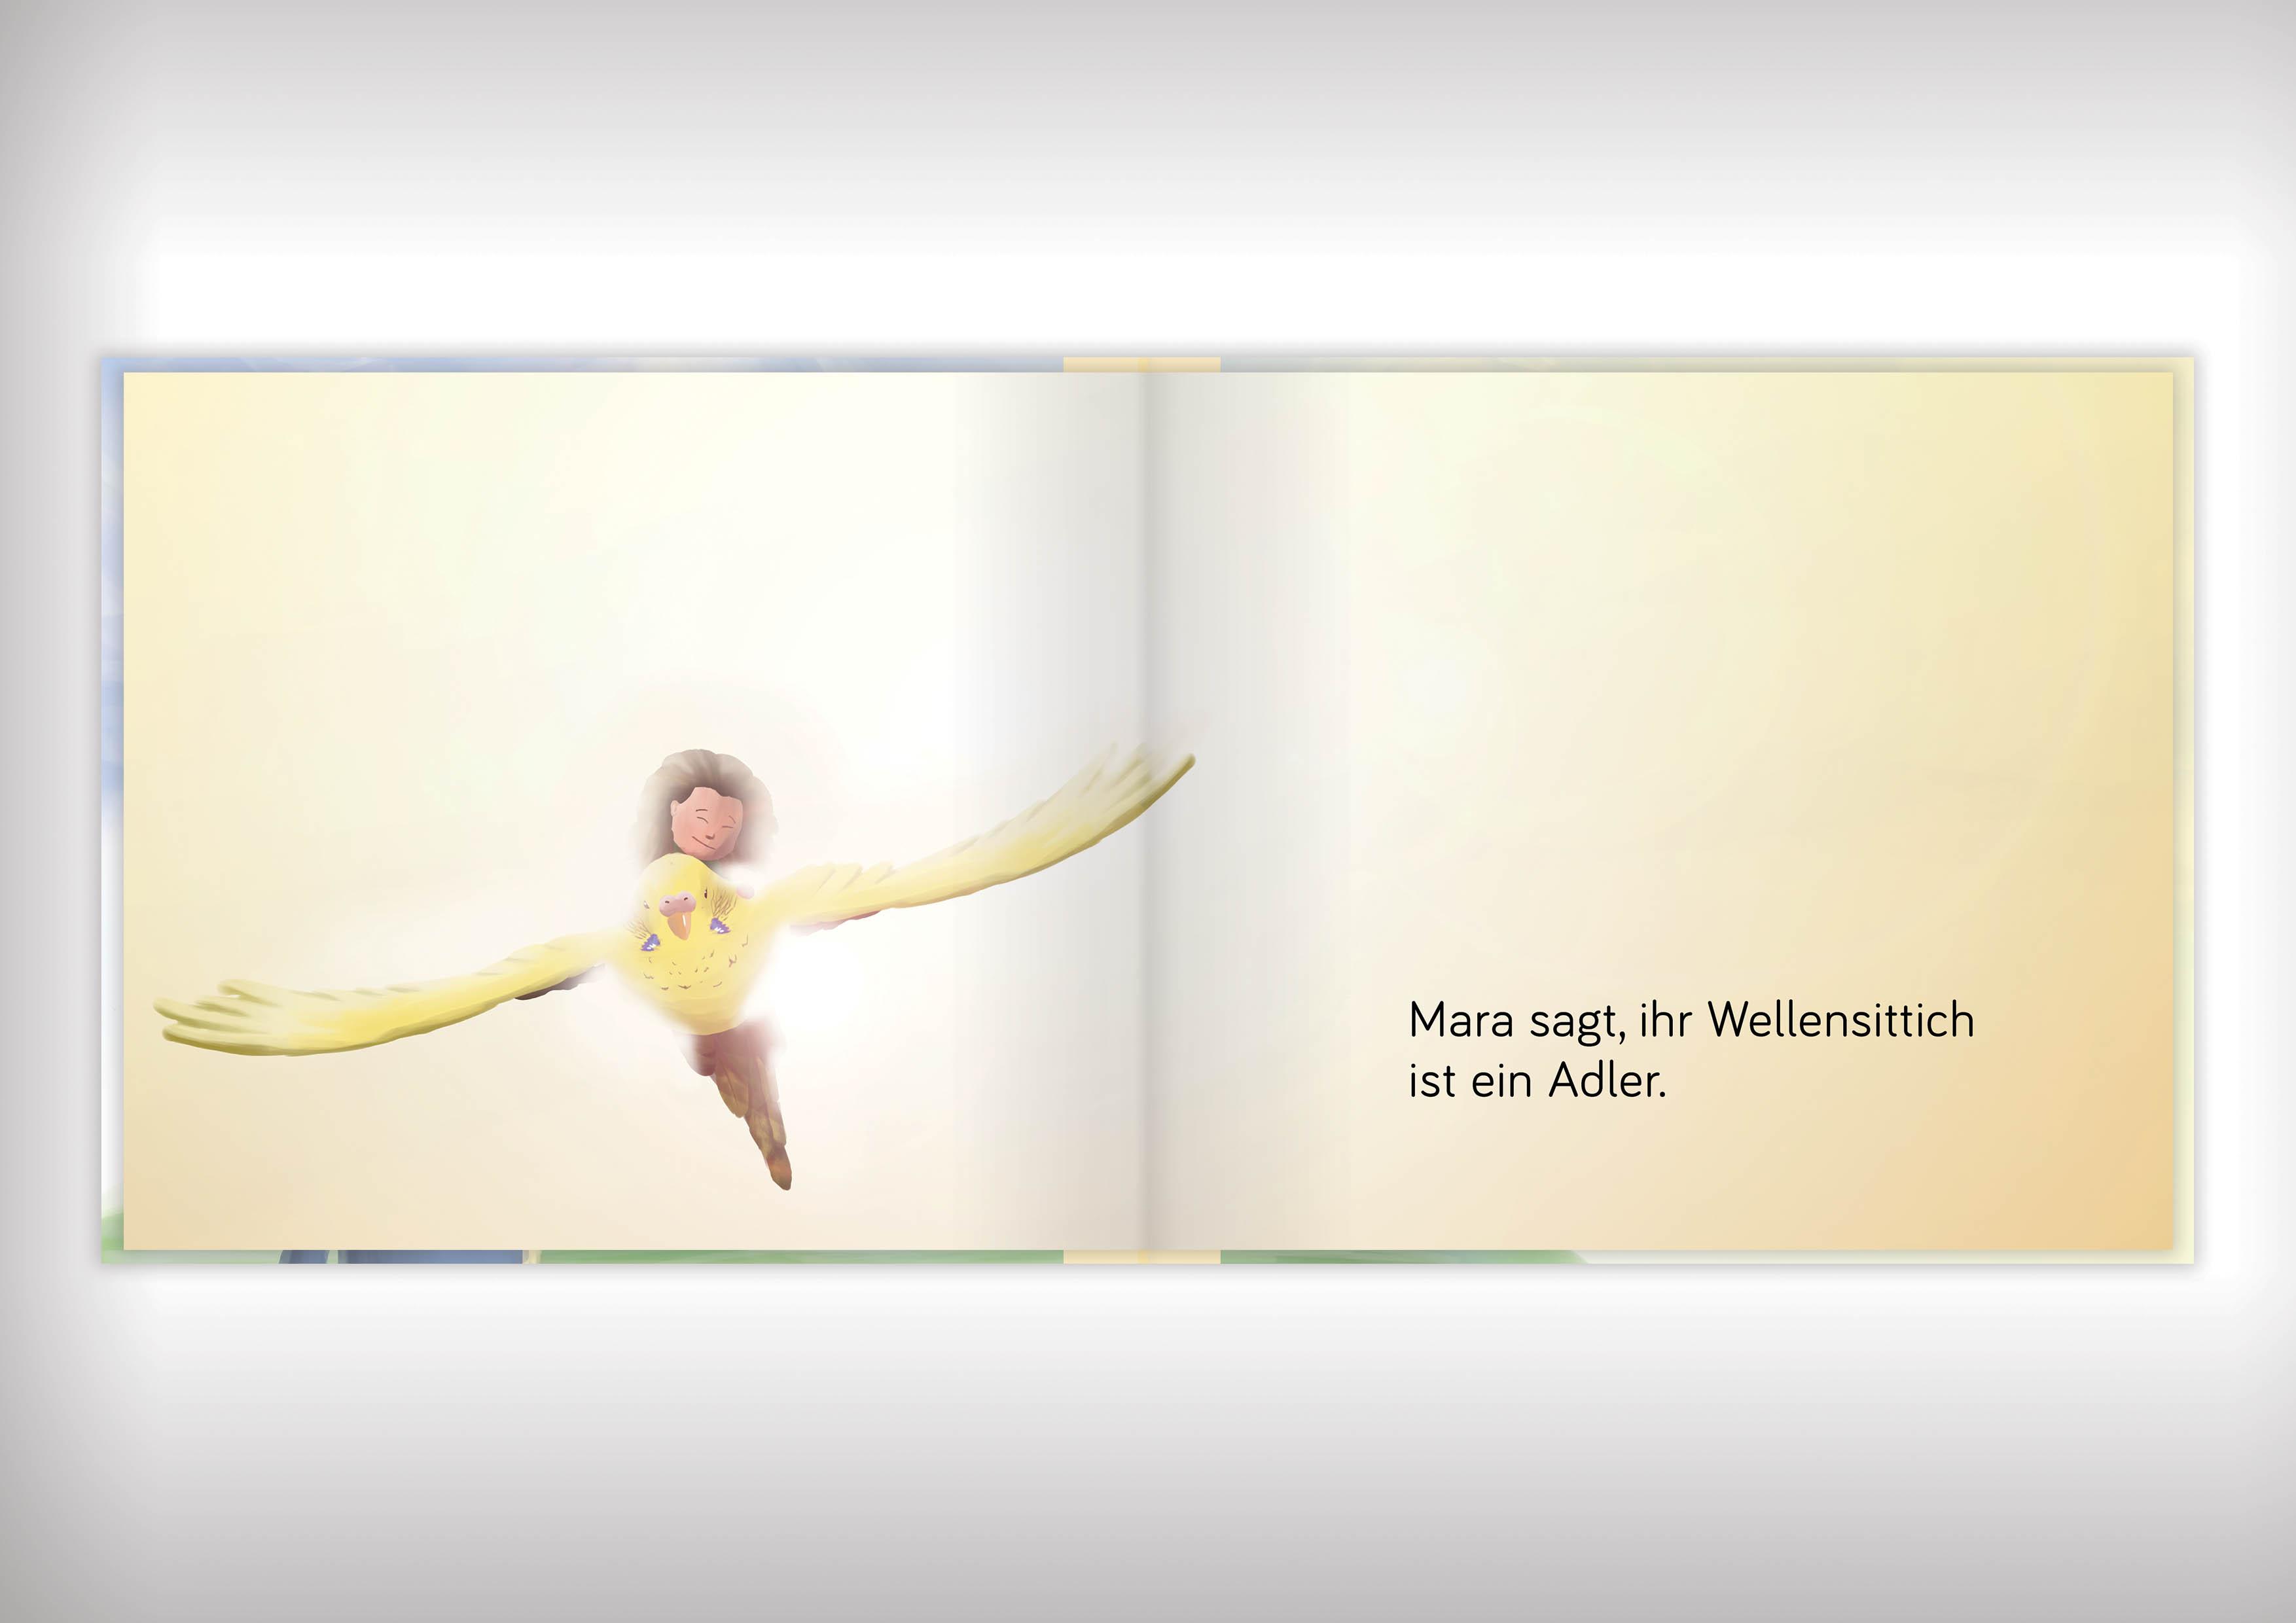 Kinderbuch_Mockup_01 MERGED_0007_Seite_28